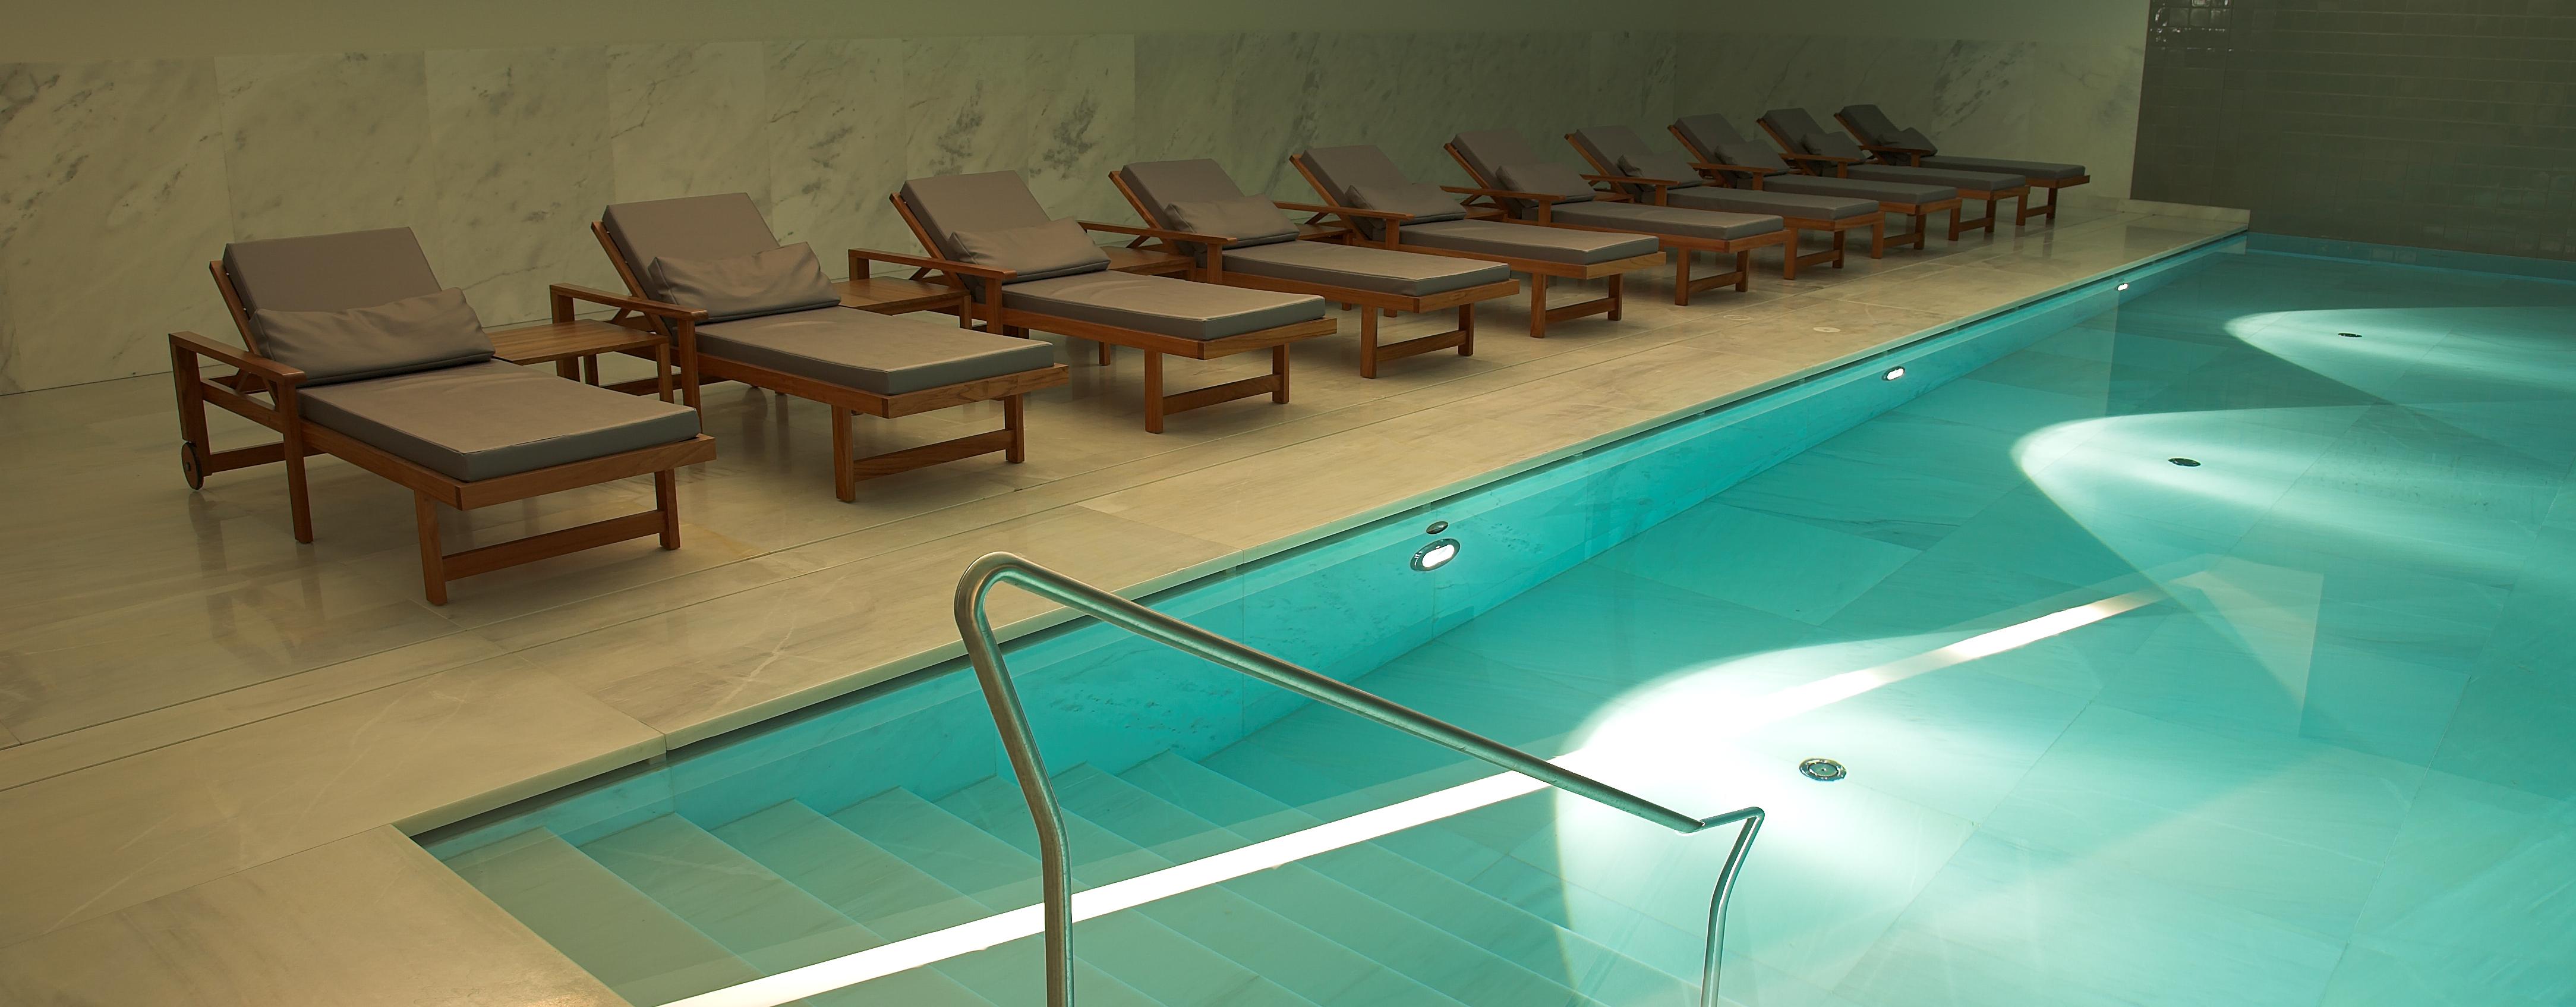 vidago-palace-spa-pool